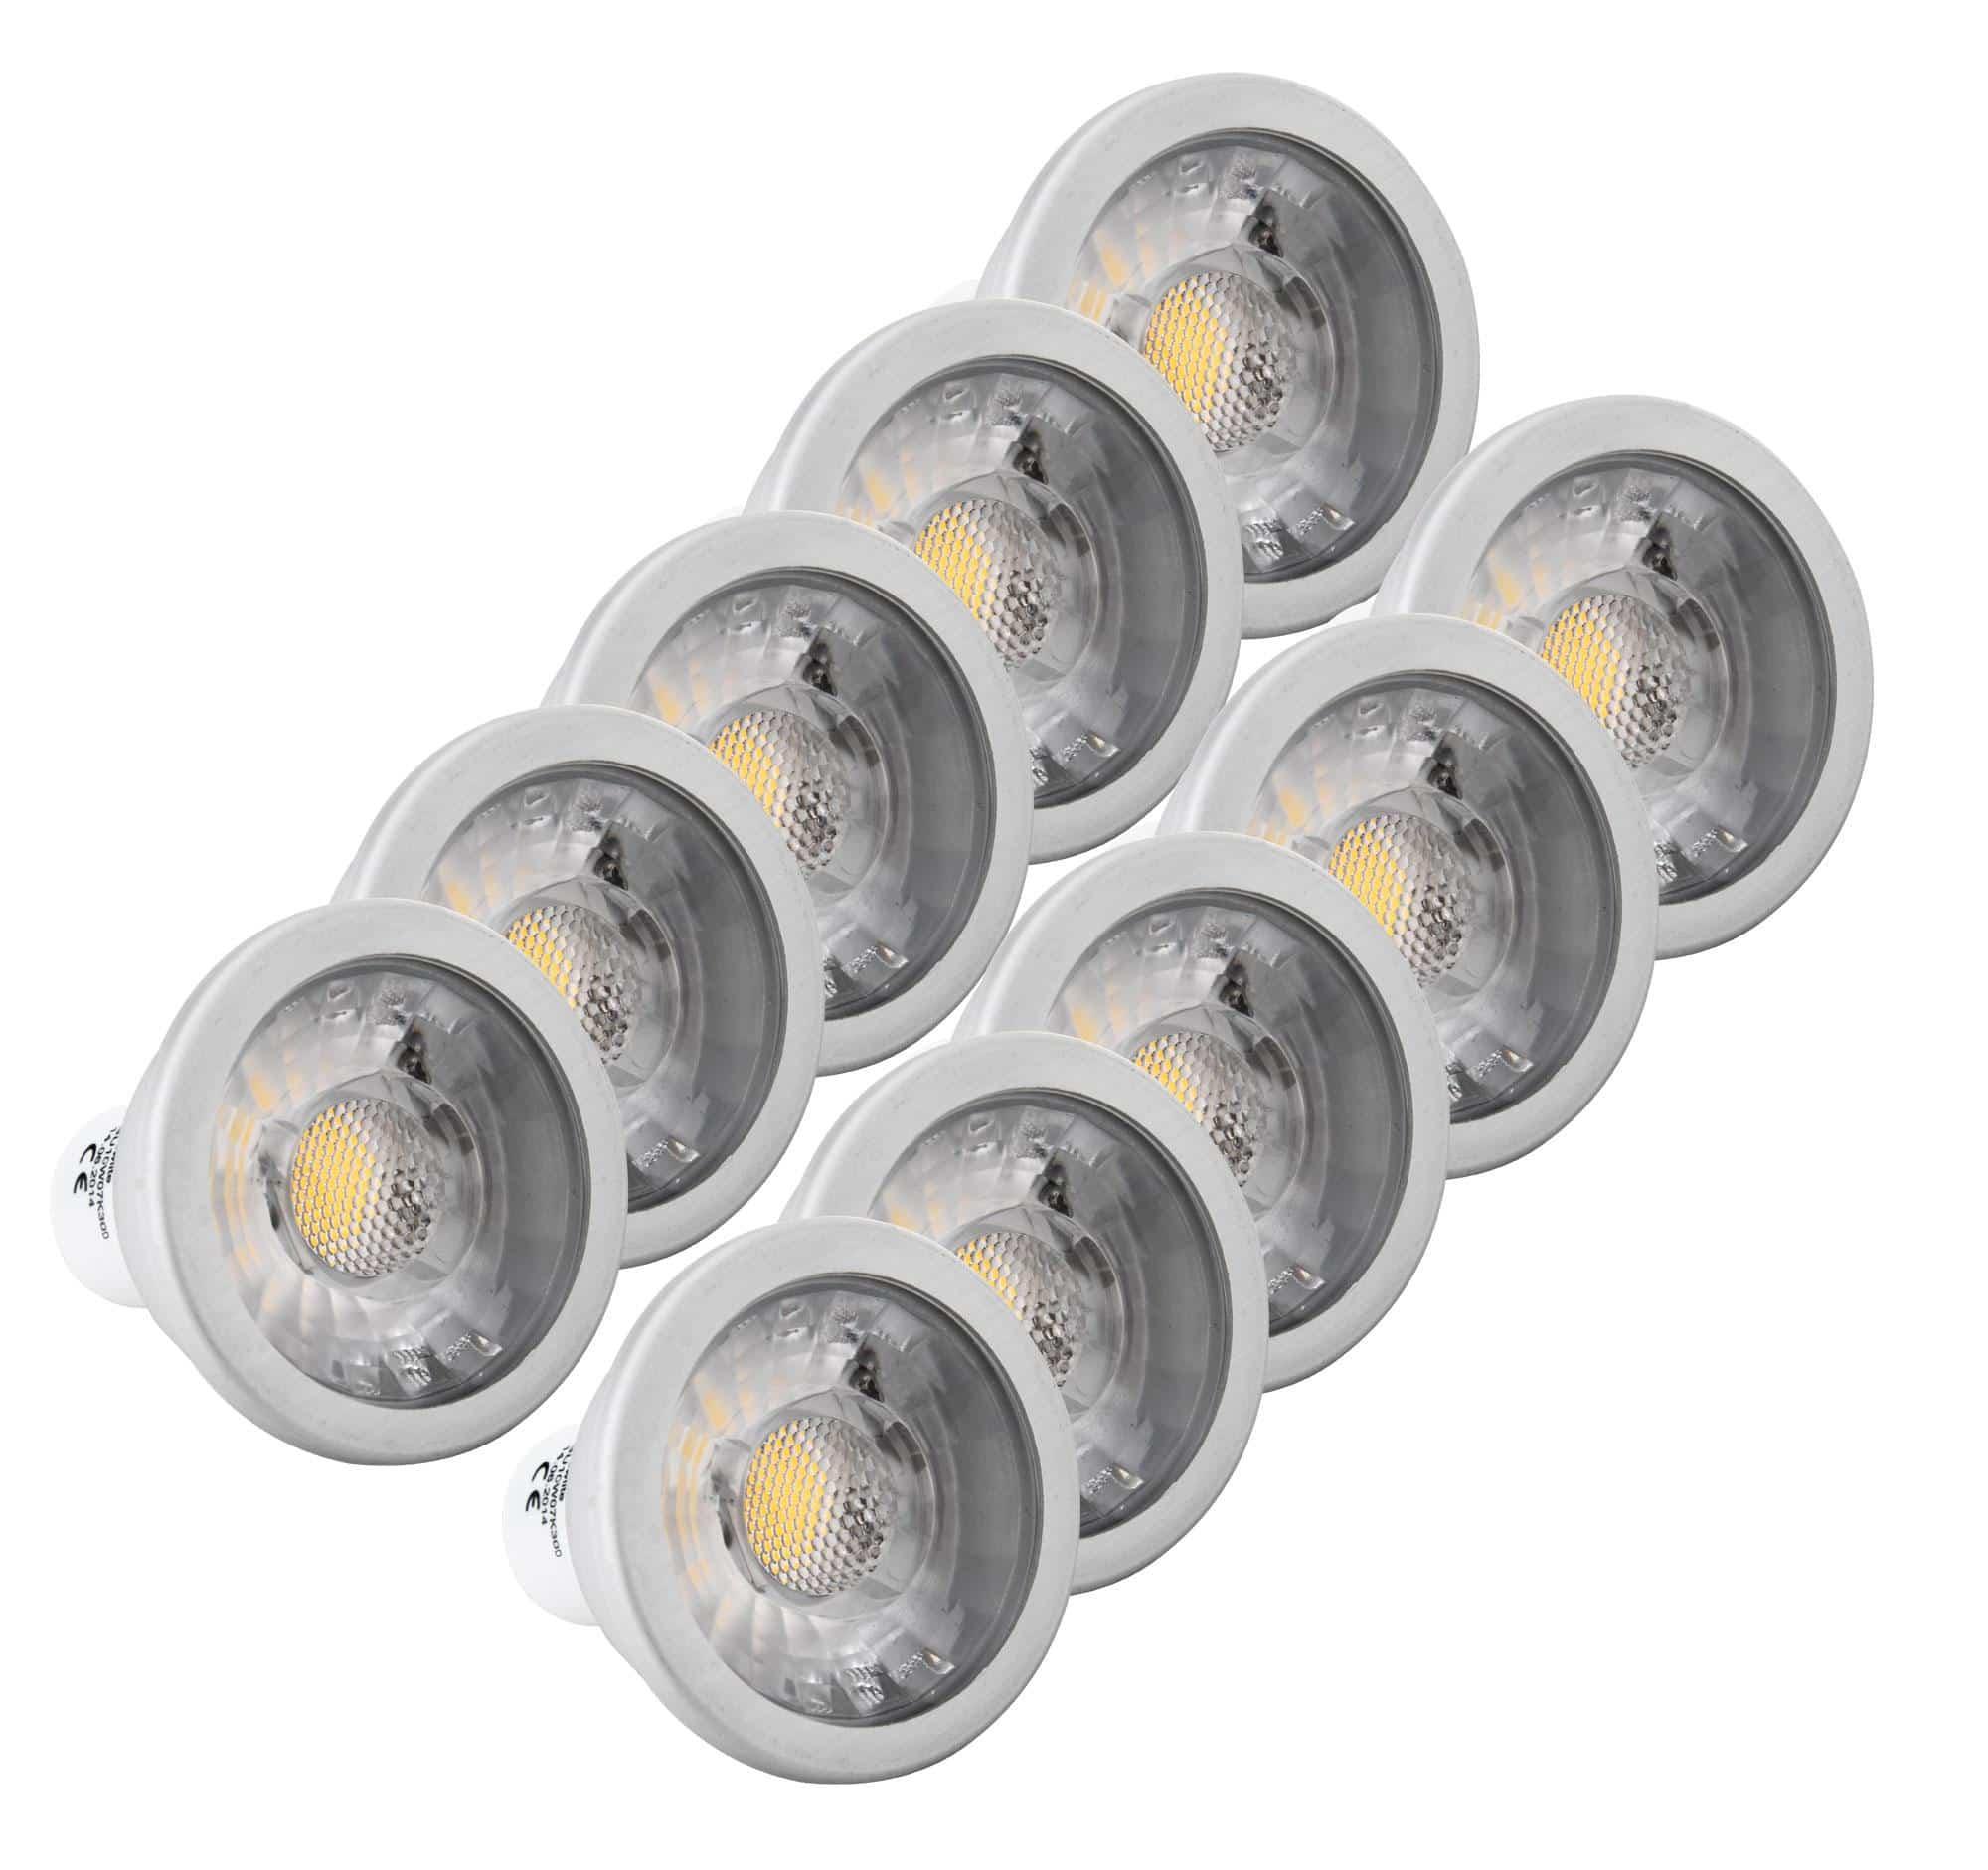 10 piece set showlite led spot cob gu10w07k30d 7 watt 550 lumens gu10 3000k dimmable. Black Bedroom Furniture Sets. Home Design Ideas